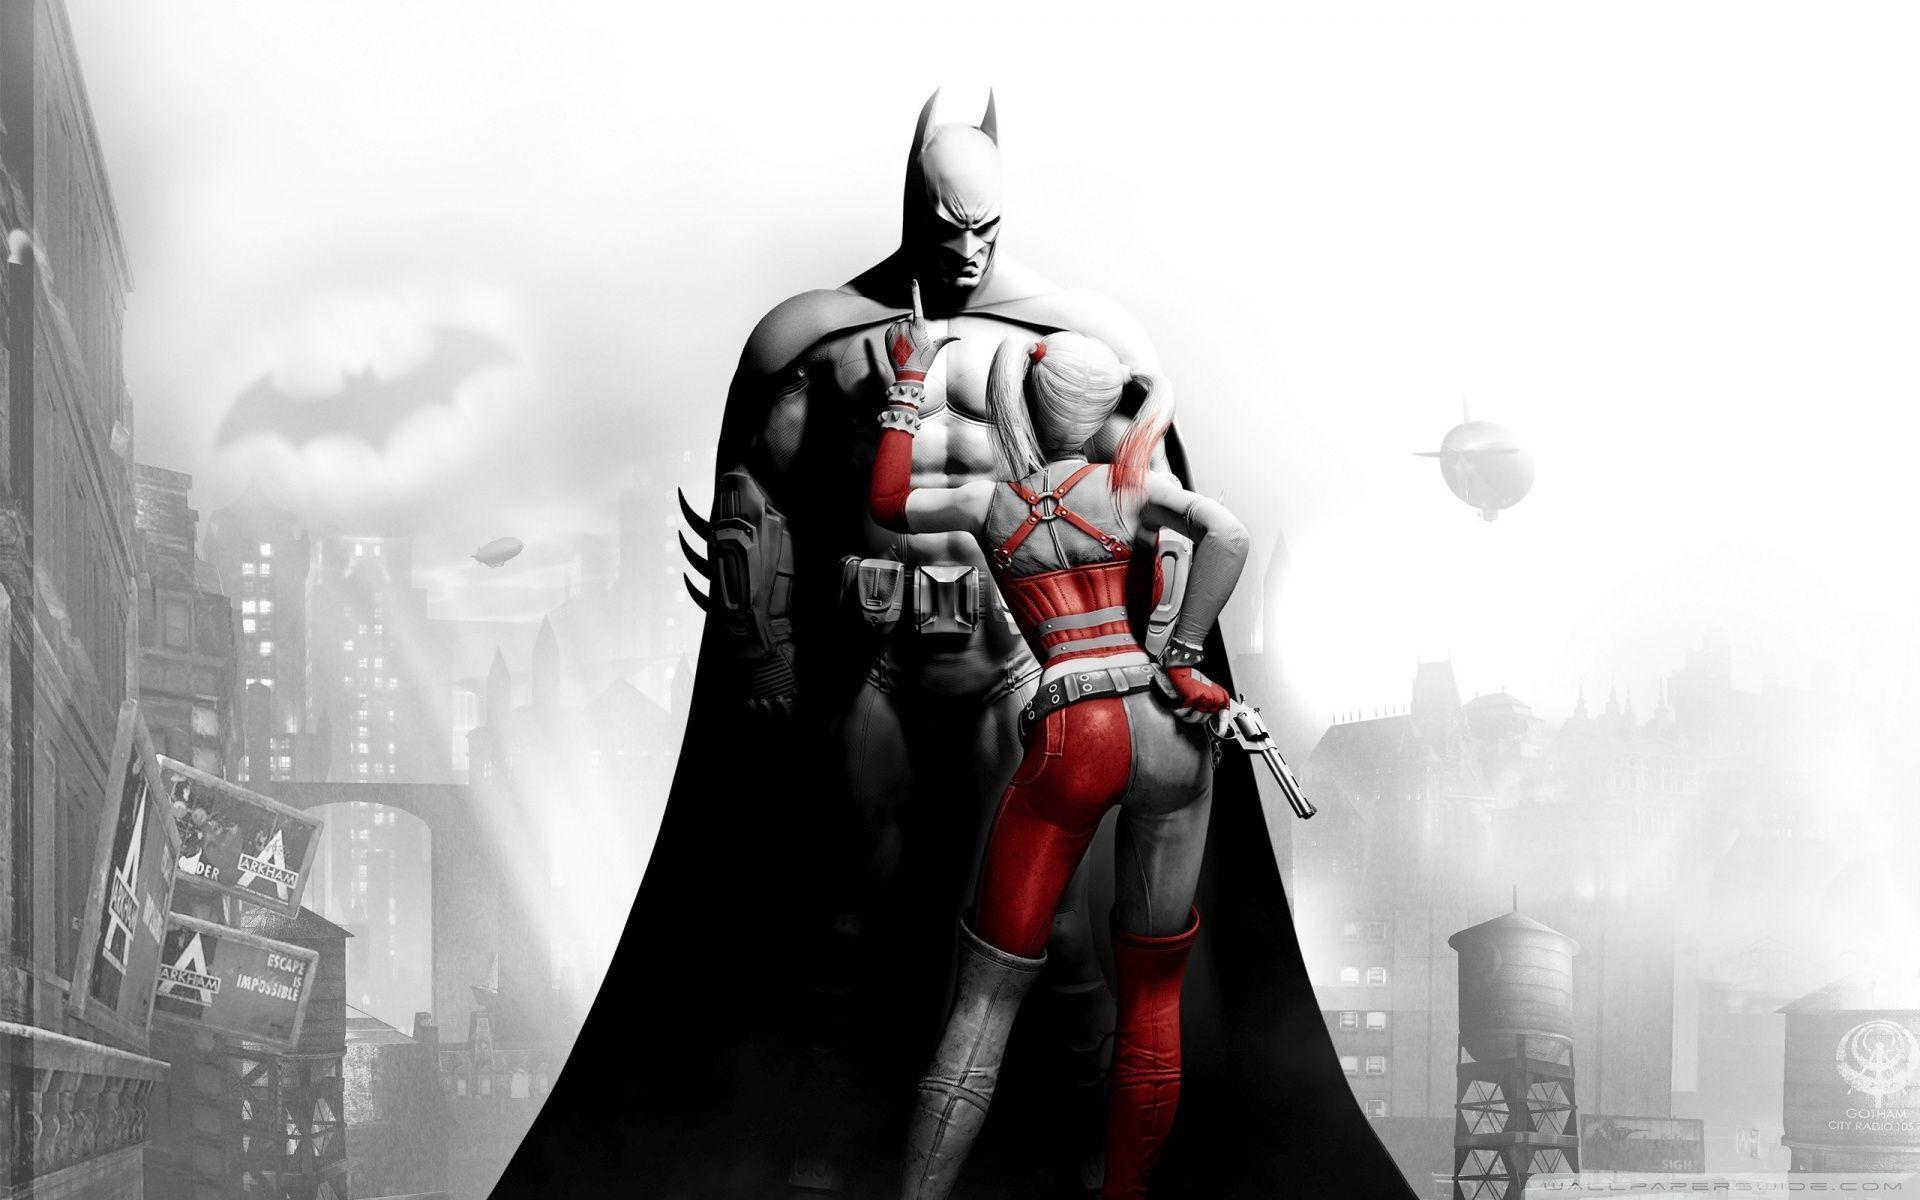 Joker Harley Quinn Wallpapers Hd 1080p Wallpaper Cave